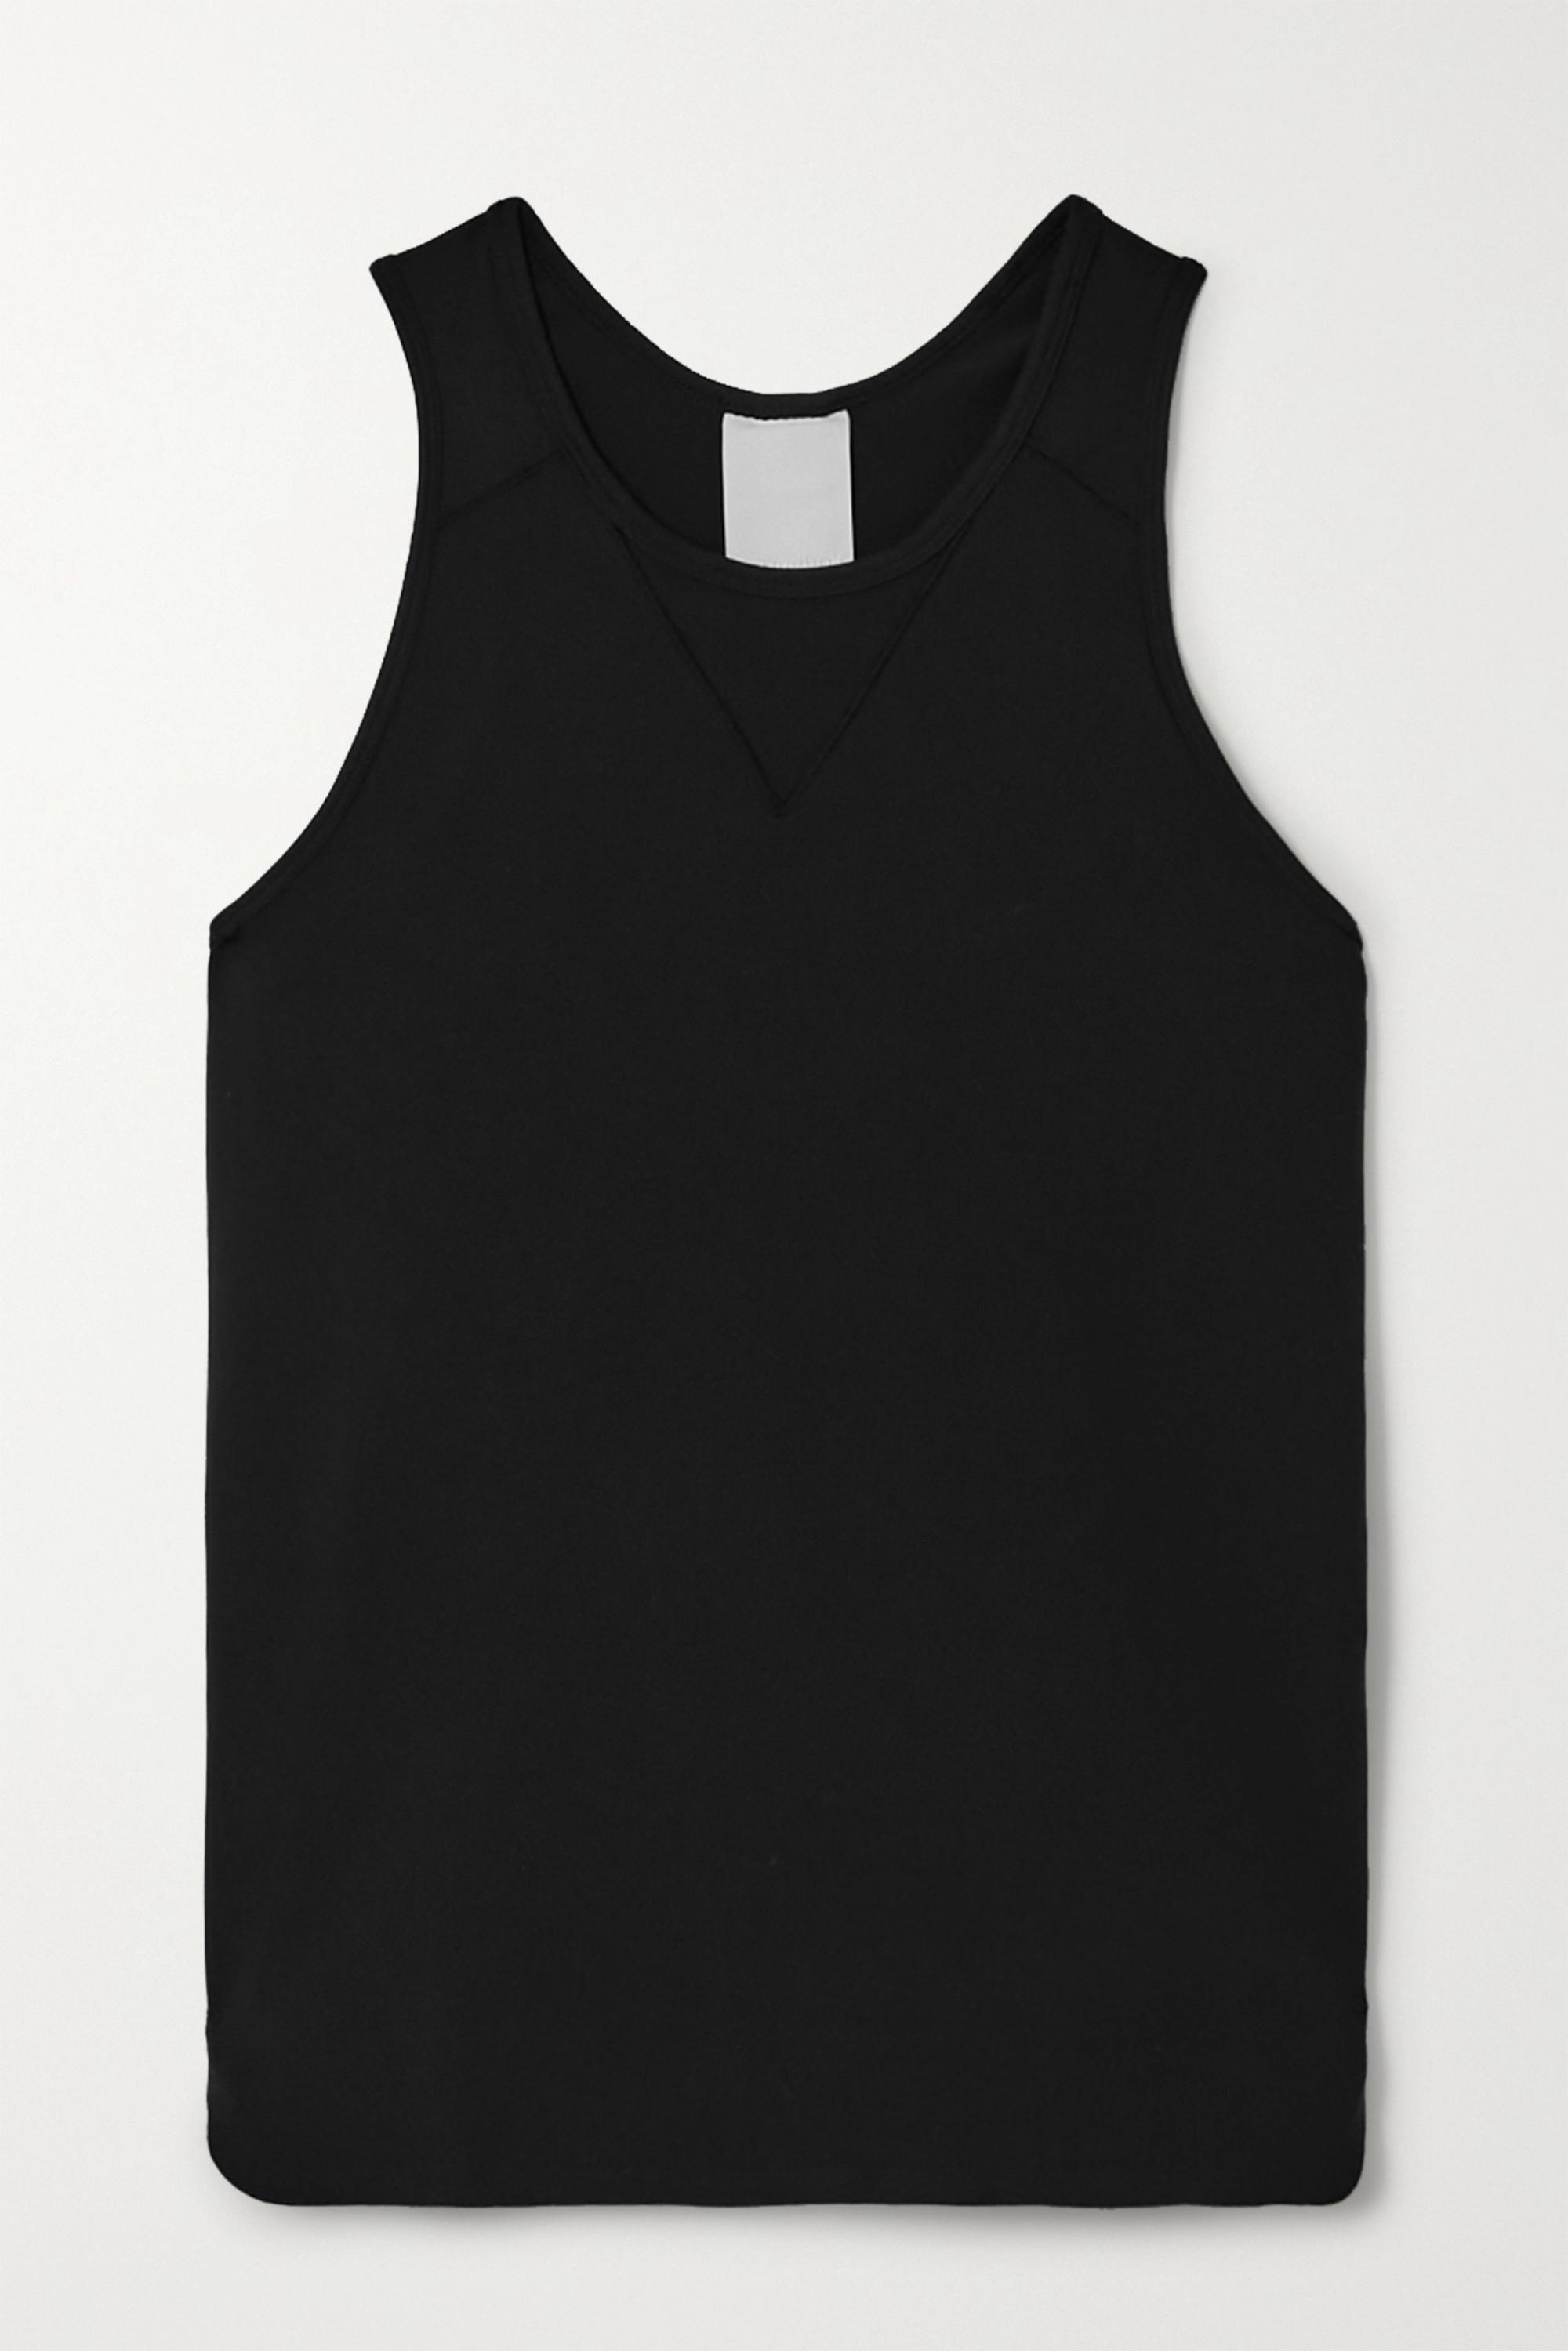 Reebok X Victoria Beckham Débardeur en jersey stretch imprimé